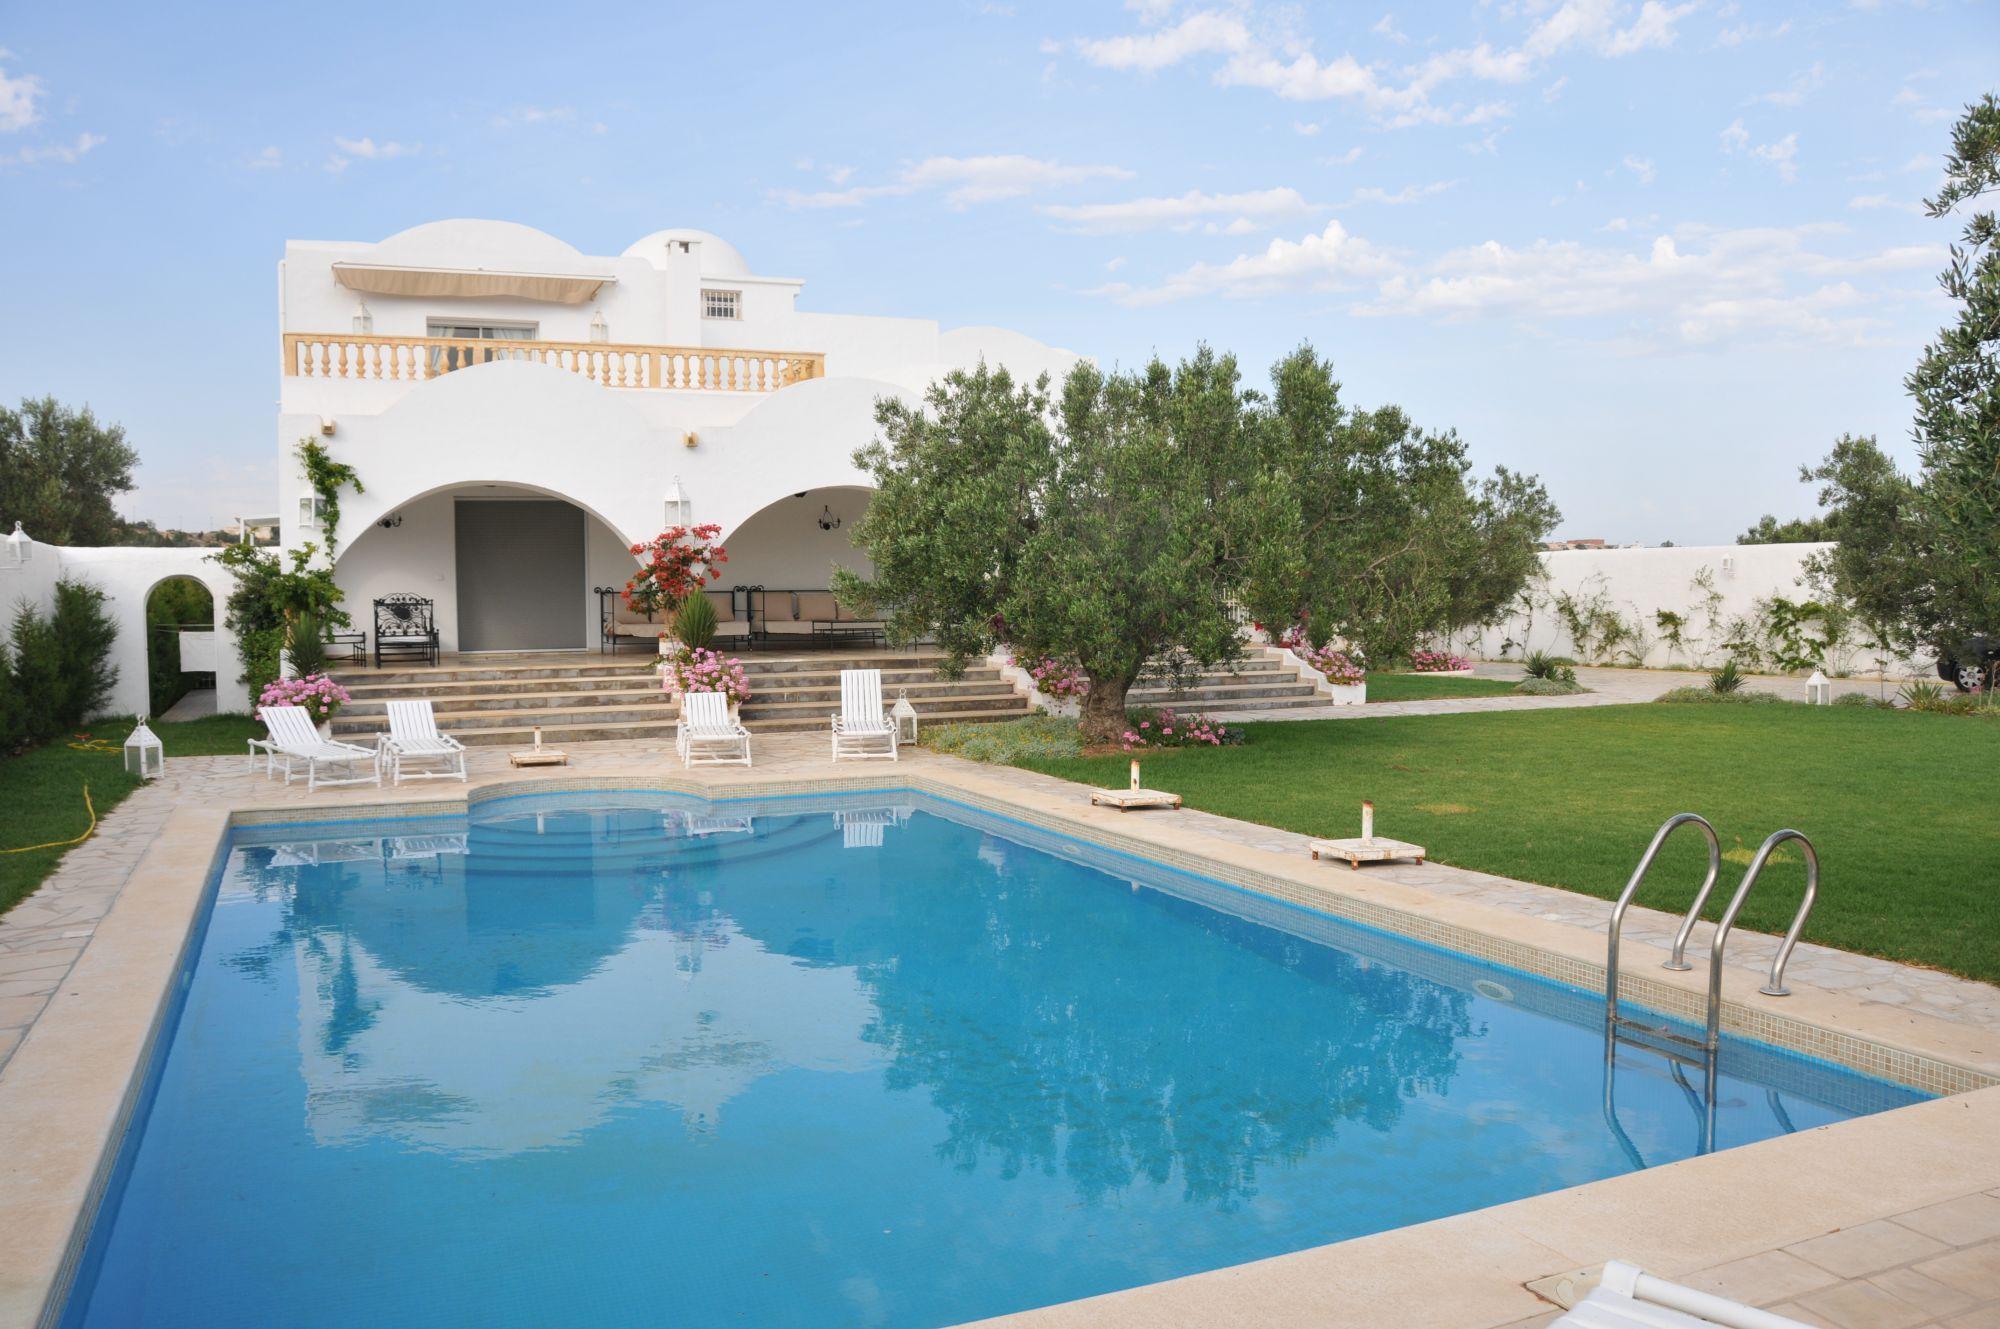 Une magnifique demeure dar pond cay location villa for Piscine demontable tunisie